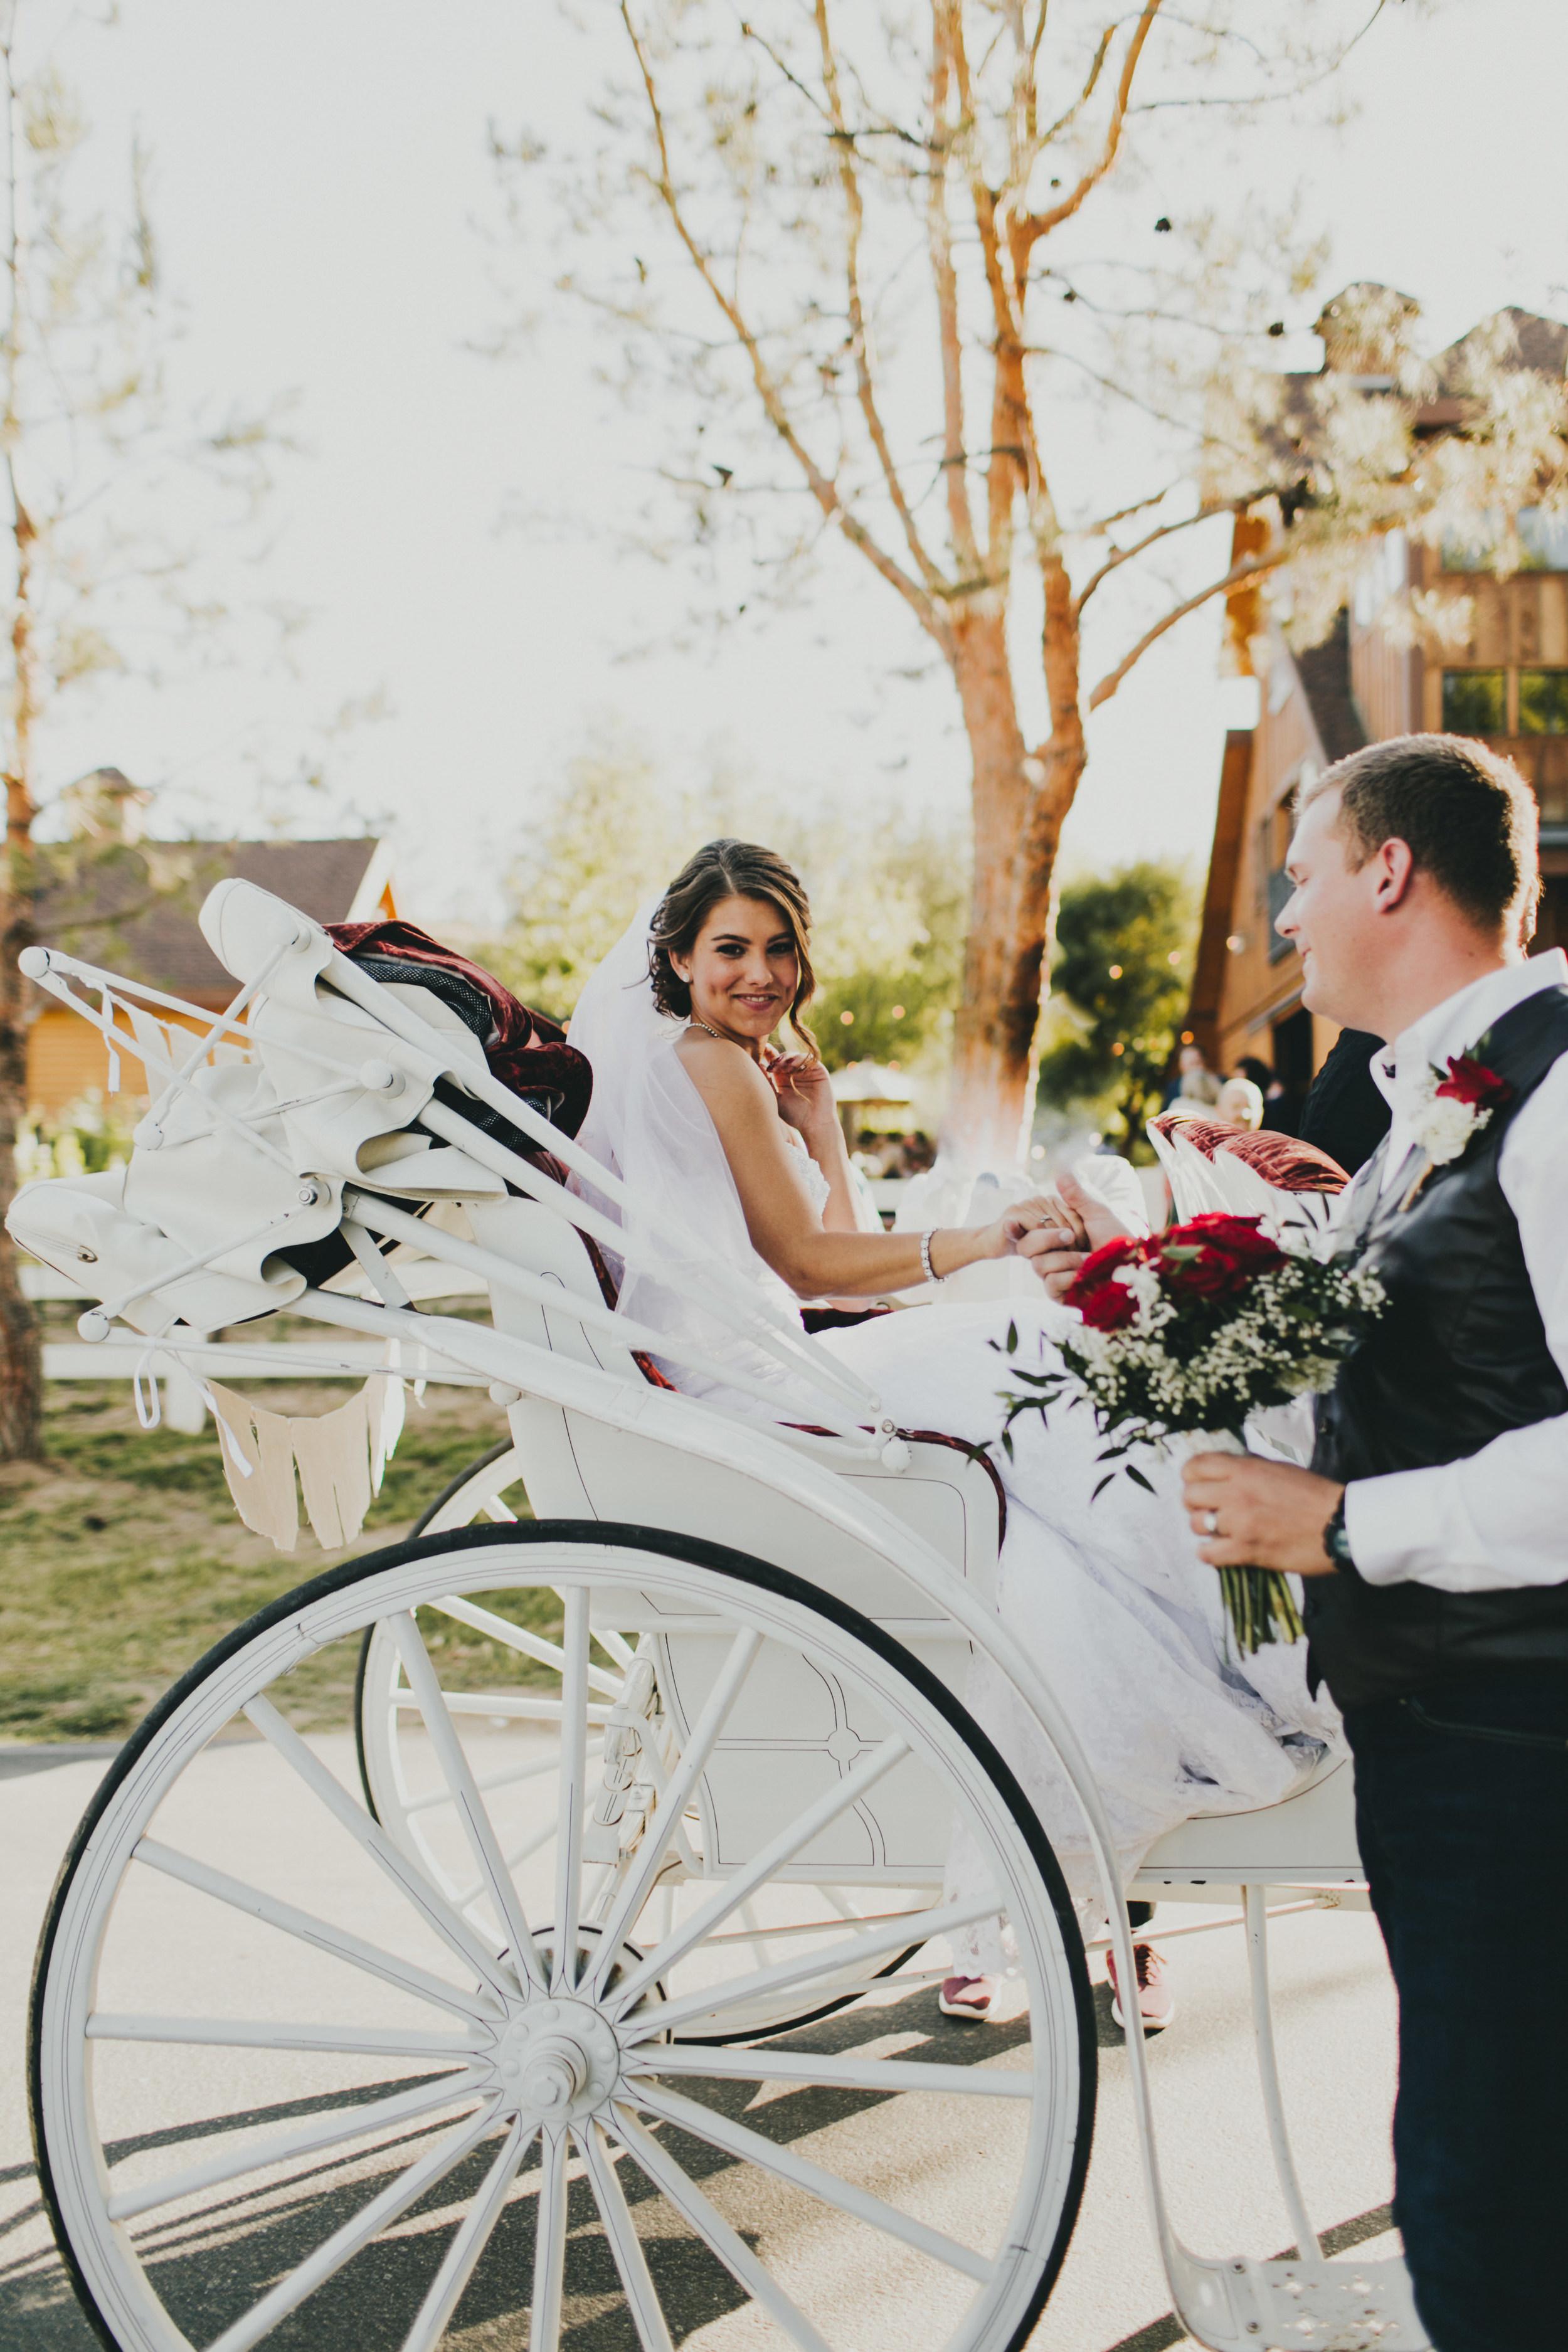 Cheyenne + Jordan - Wedding, Natalie Griffo (70 of 157).jpg